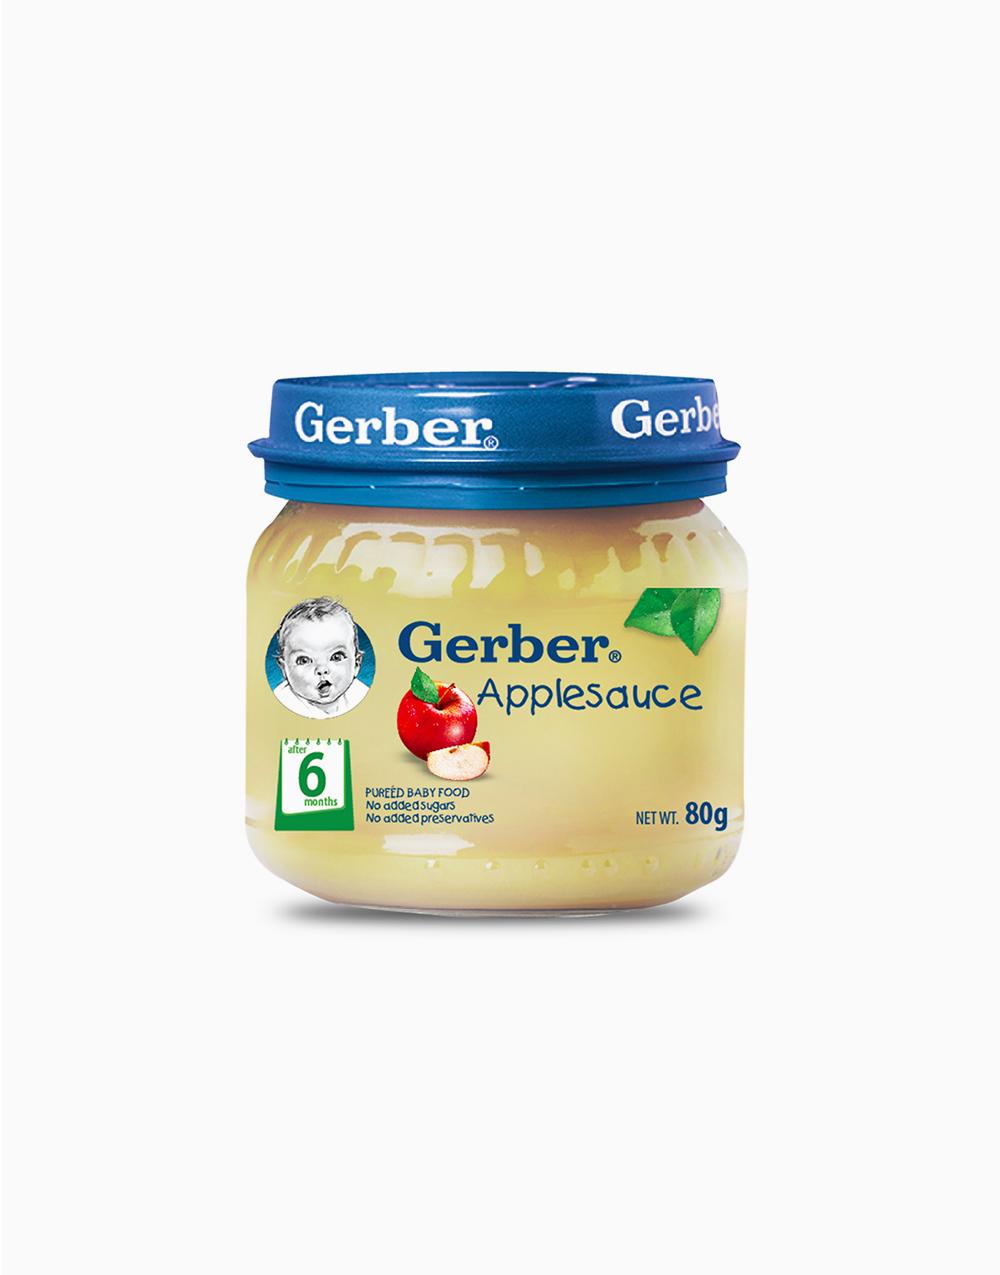 Applesauce Baby Food (80g) by Gerber